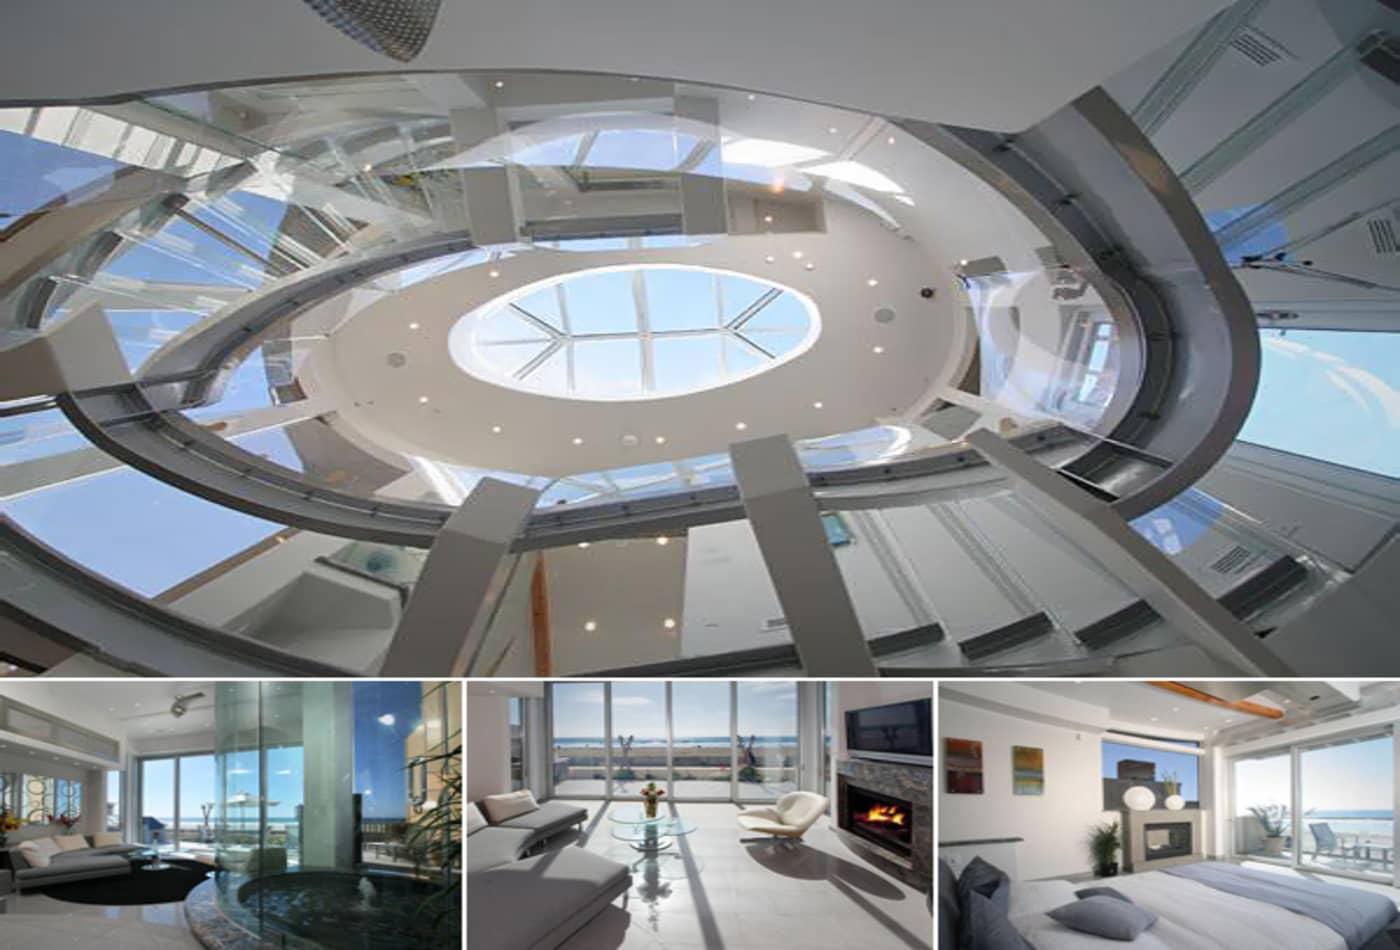 48741888 Beach-House-Retractable-Roof-Unique-Million-Dollar-Homes-CNBC.jpg